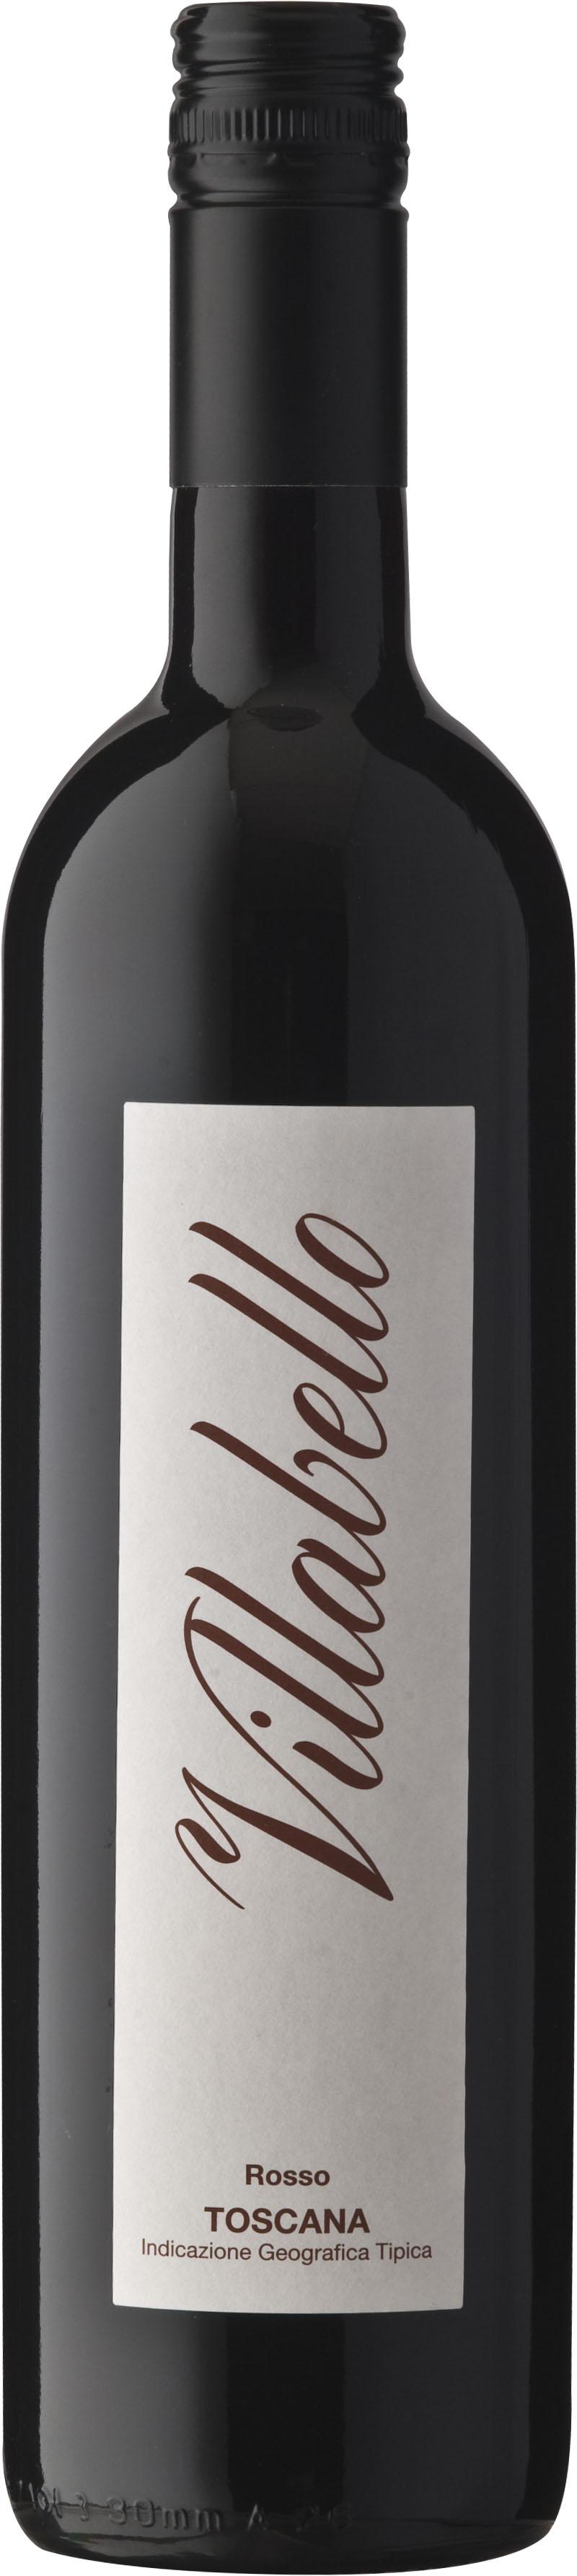 villabello-rosso-di-toscana-igt_2462-(2)